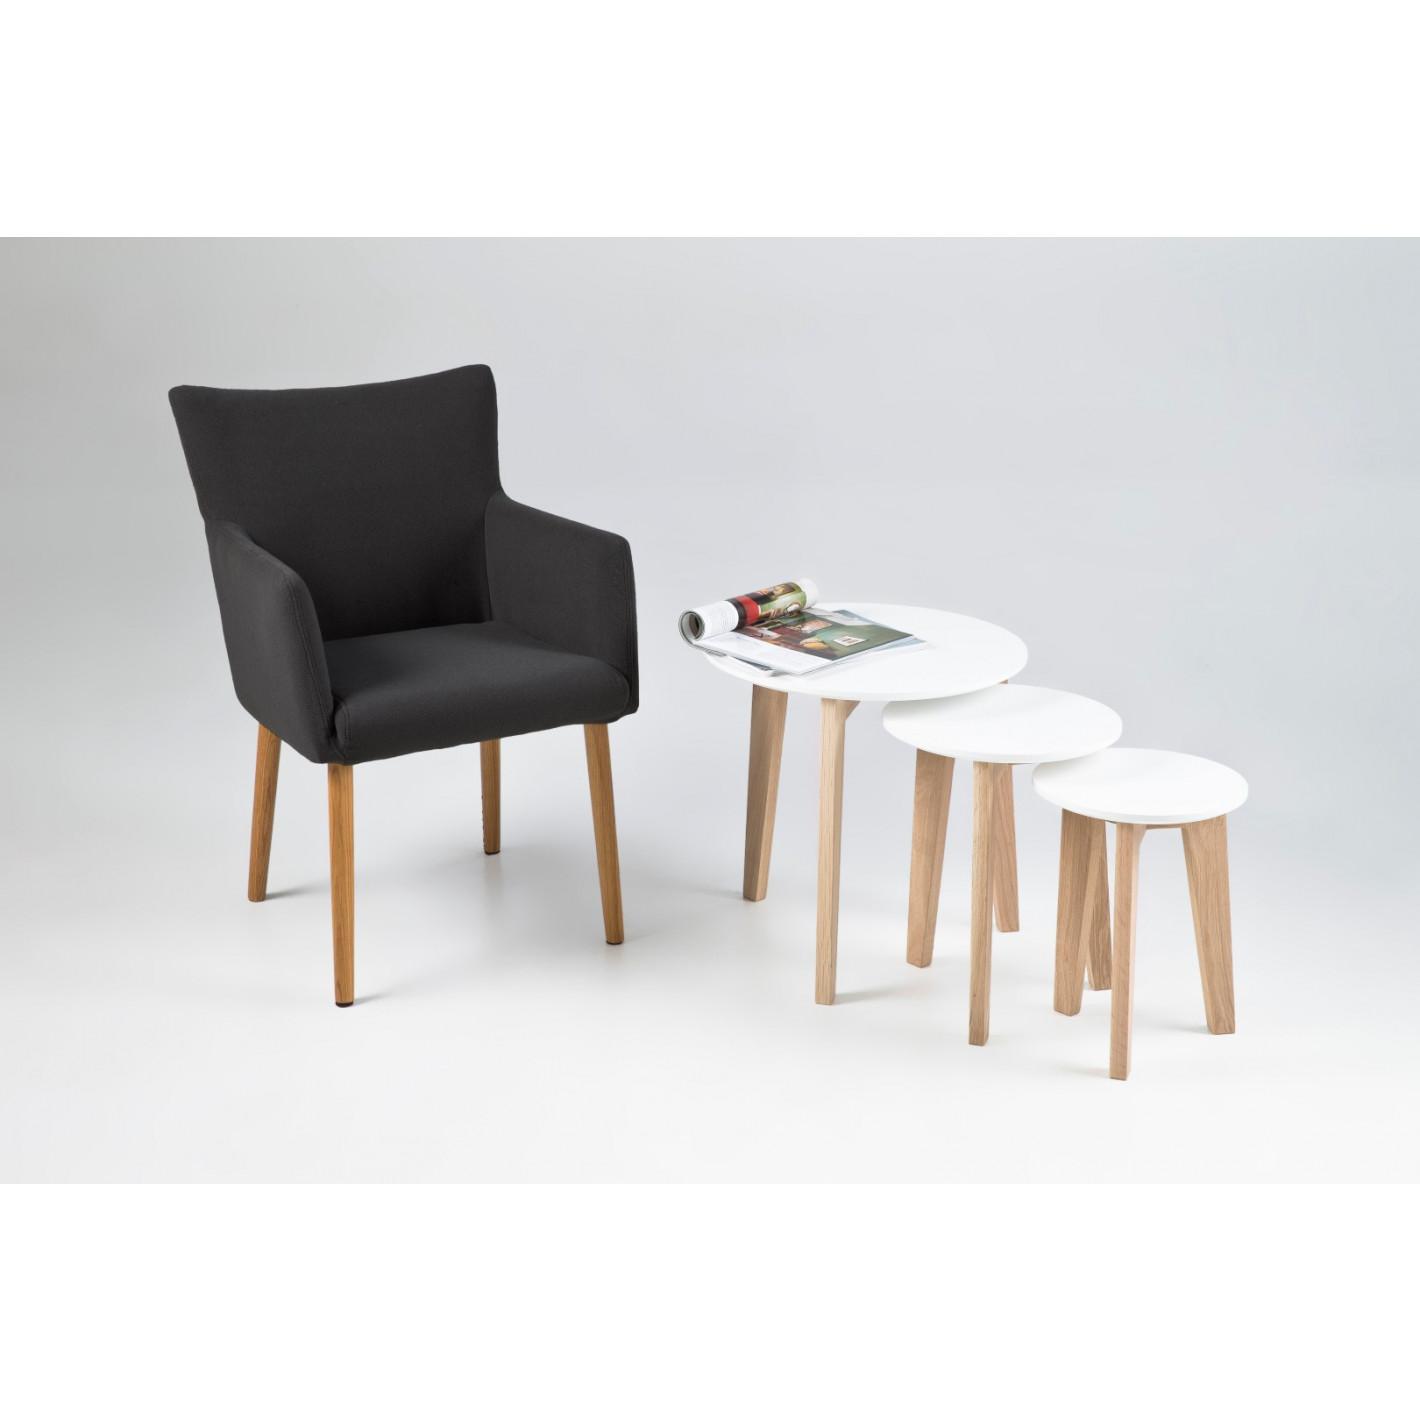 Set of 3 Coffee Tables Niba | White